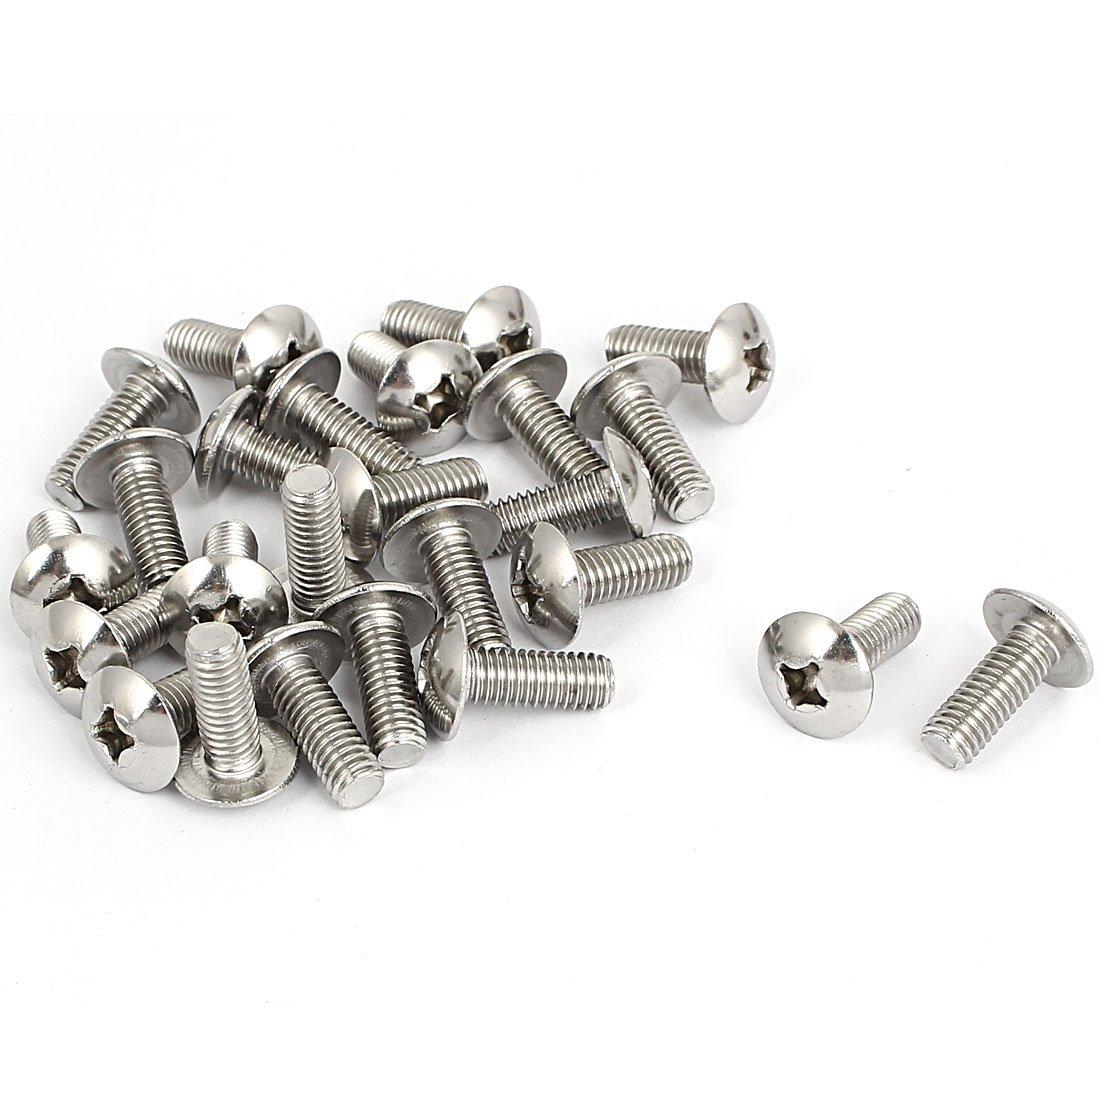 M6x16mm Stainless Steel Truss Phillips Head Machine Screws 25pcs